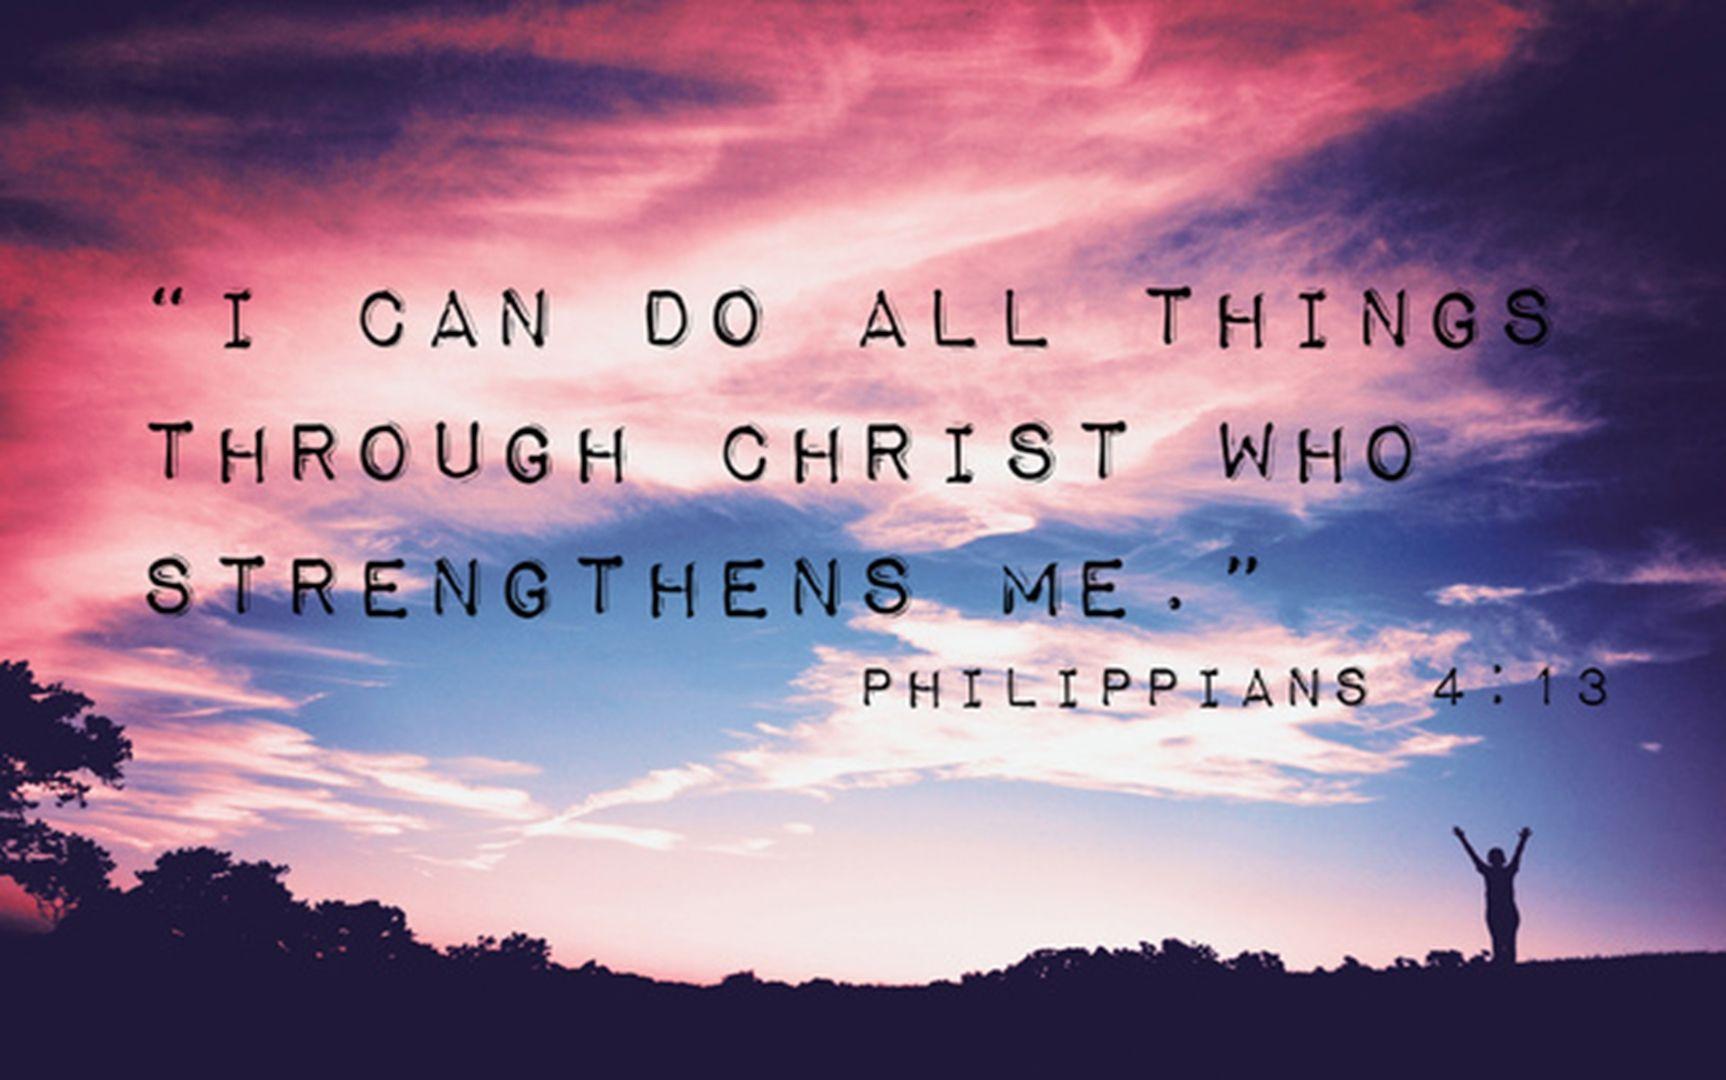 Philippians 4 13 Jpg 1726 1080 Philippians Verses Wallpaper Bible Verse Wallpaper